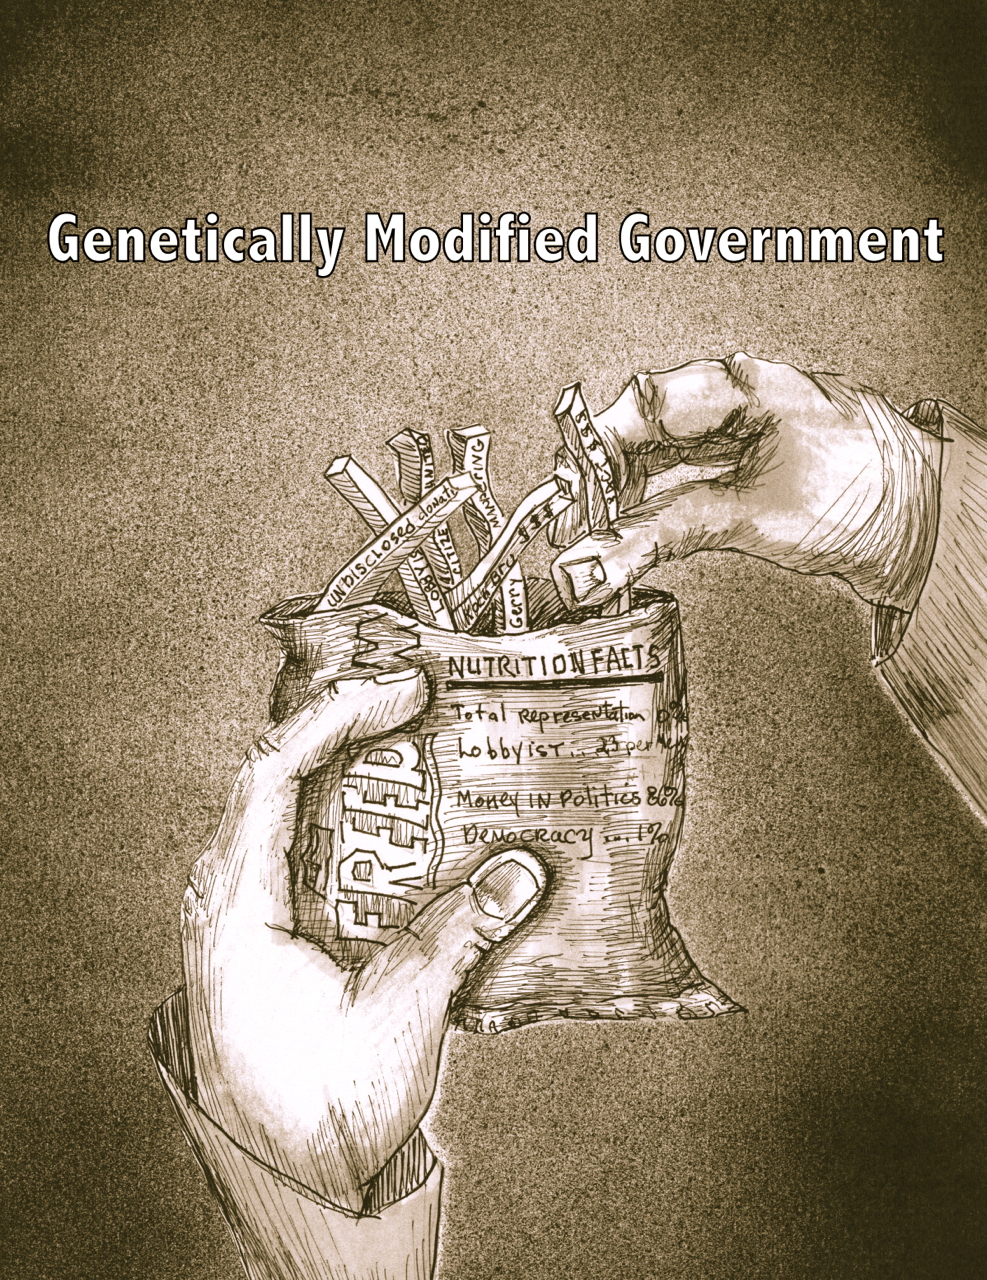 Genetically Modified Politics - 8 x 11 - Ink